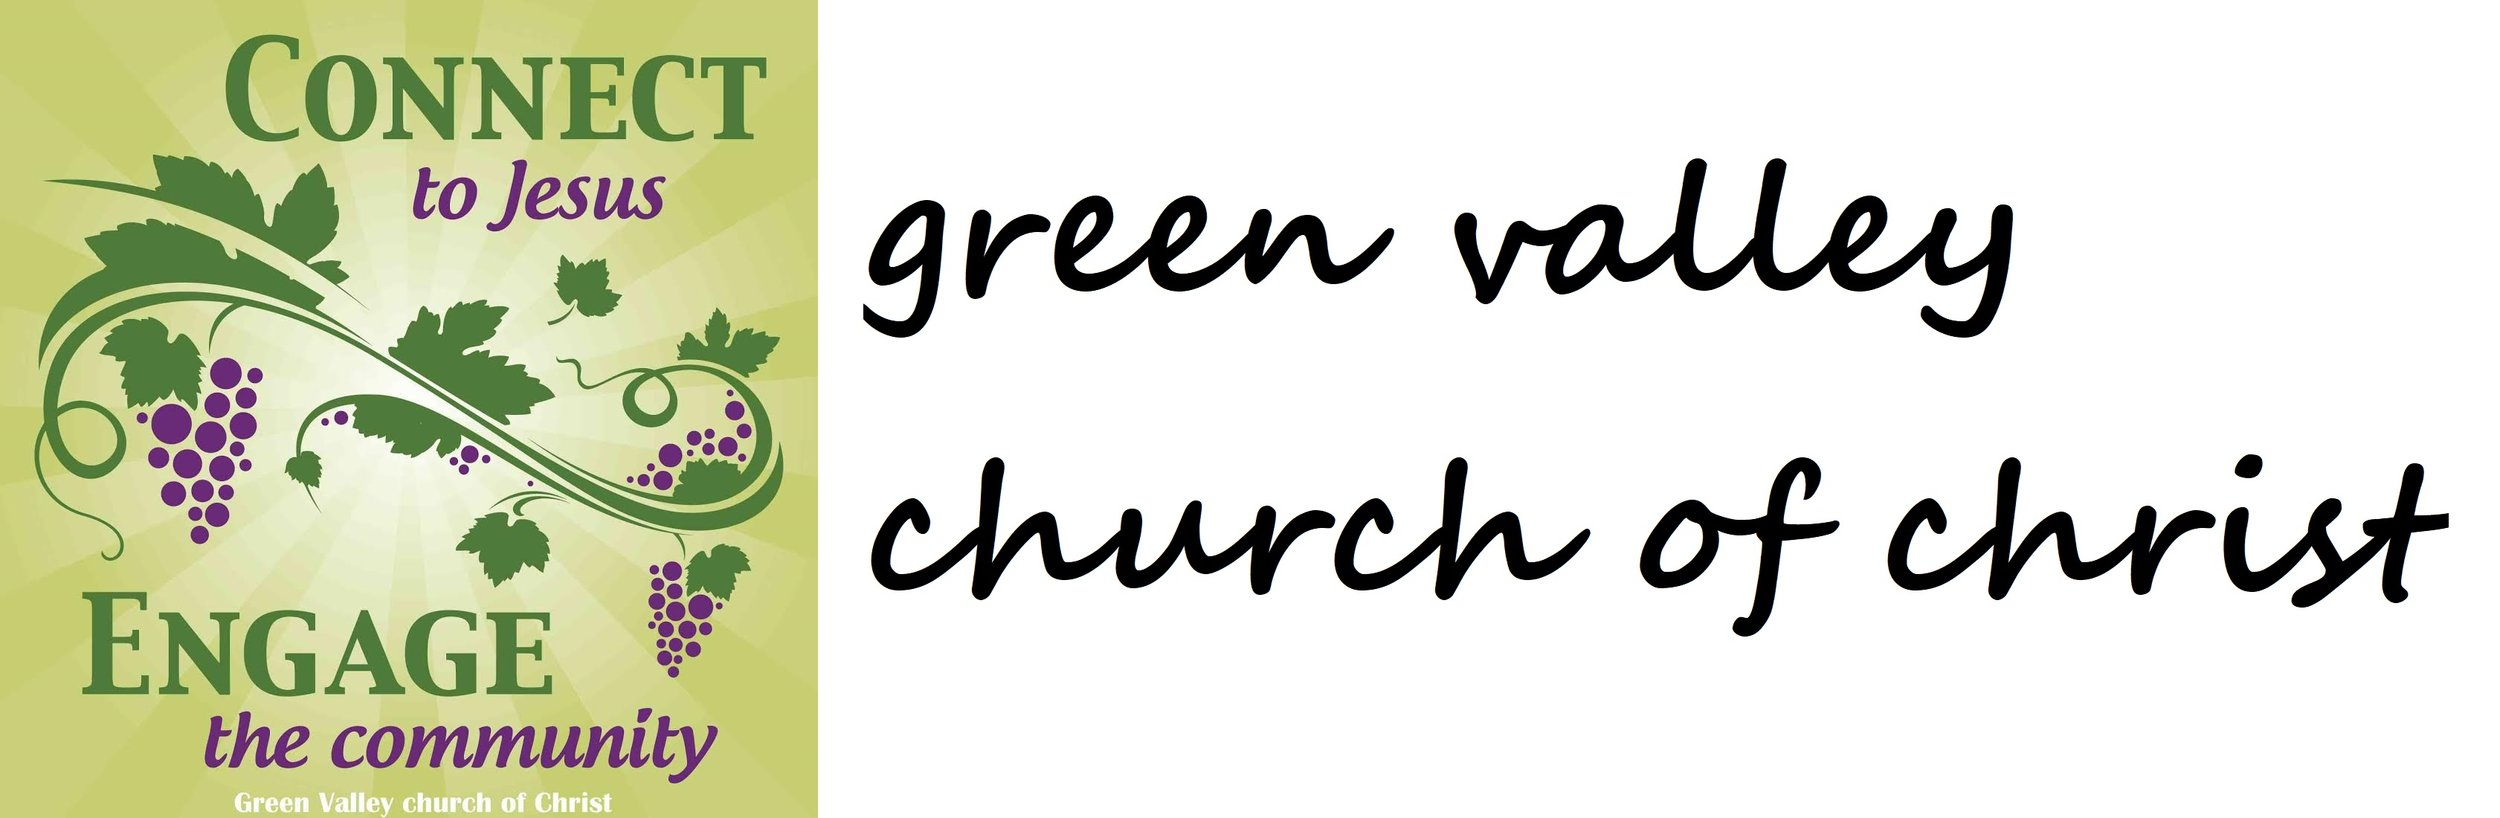 GreenValleyLogo2018.jpg